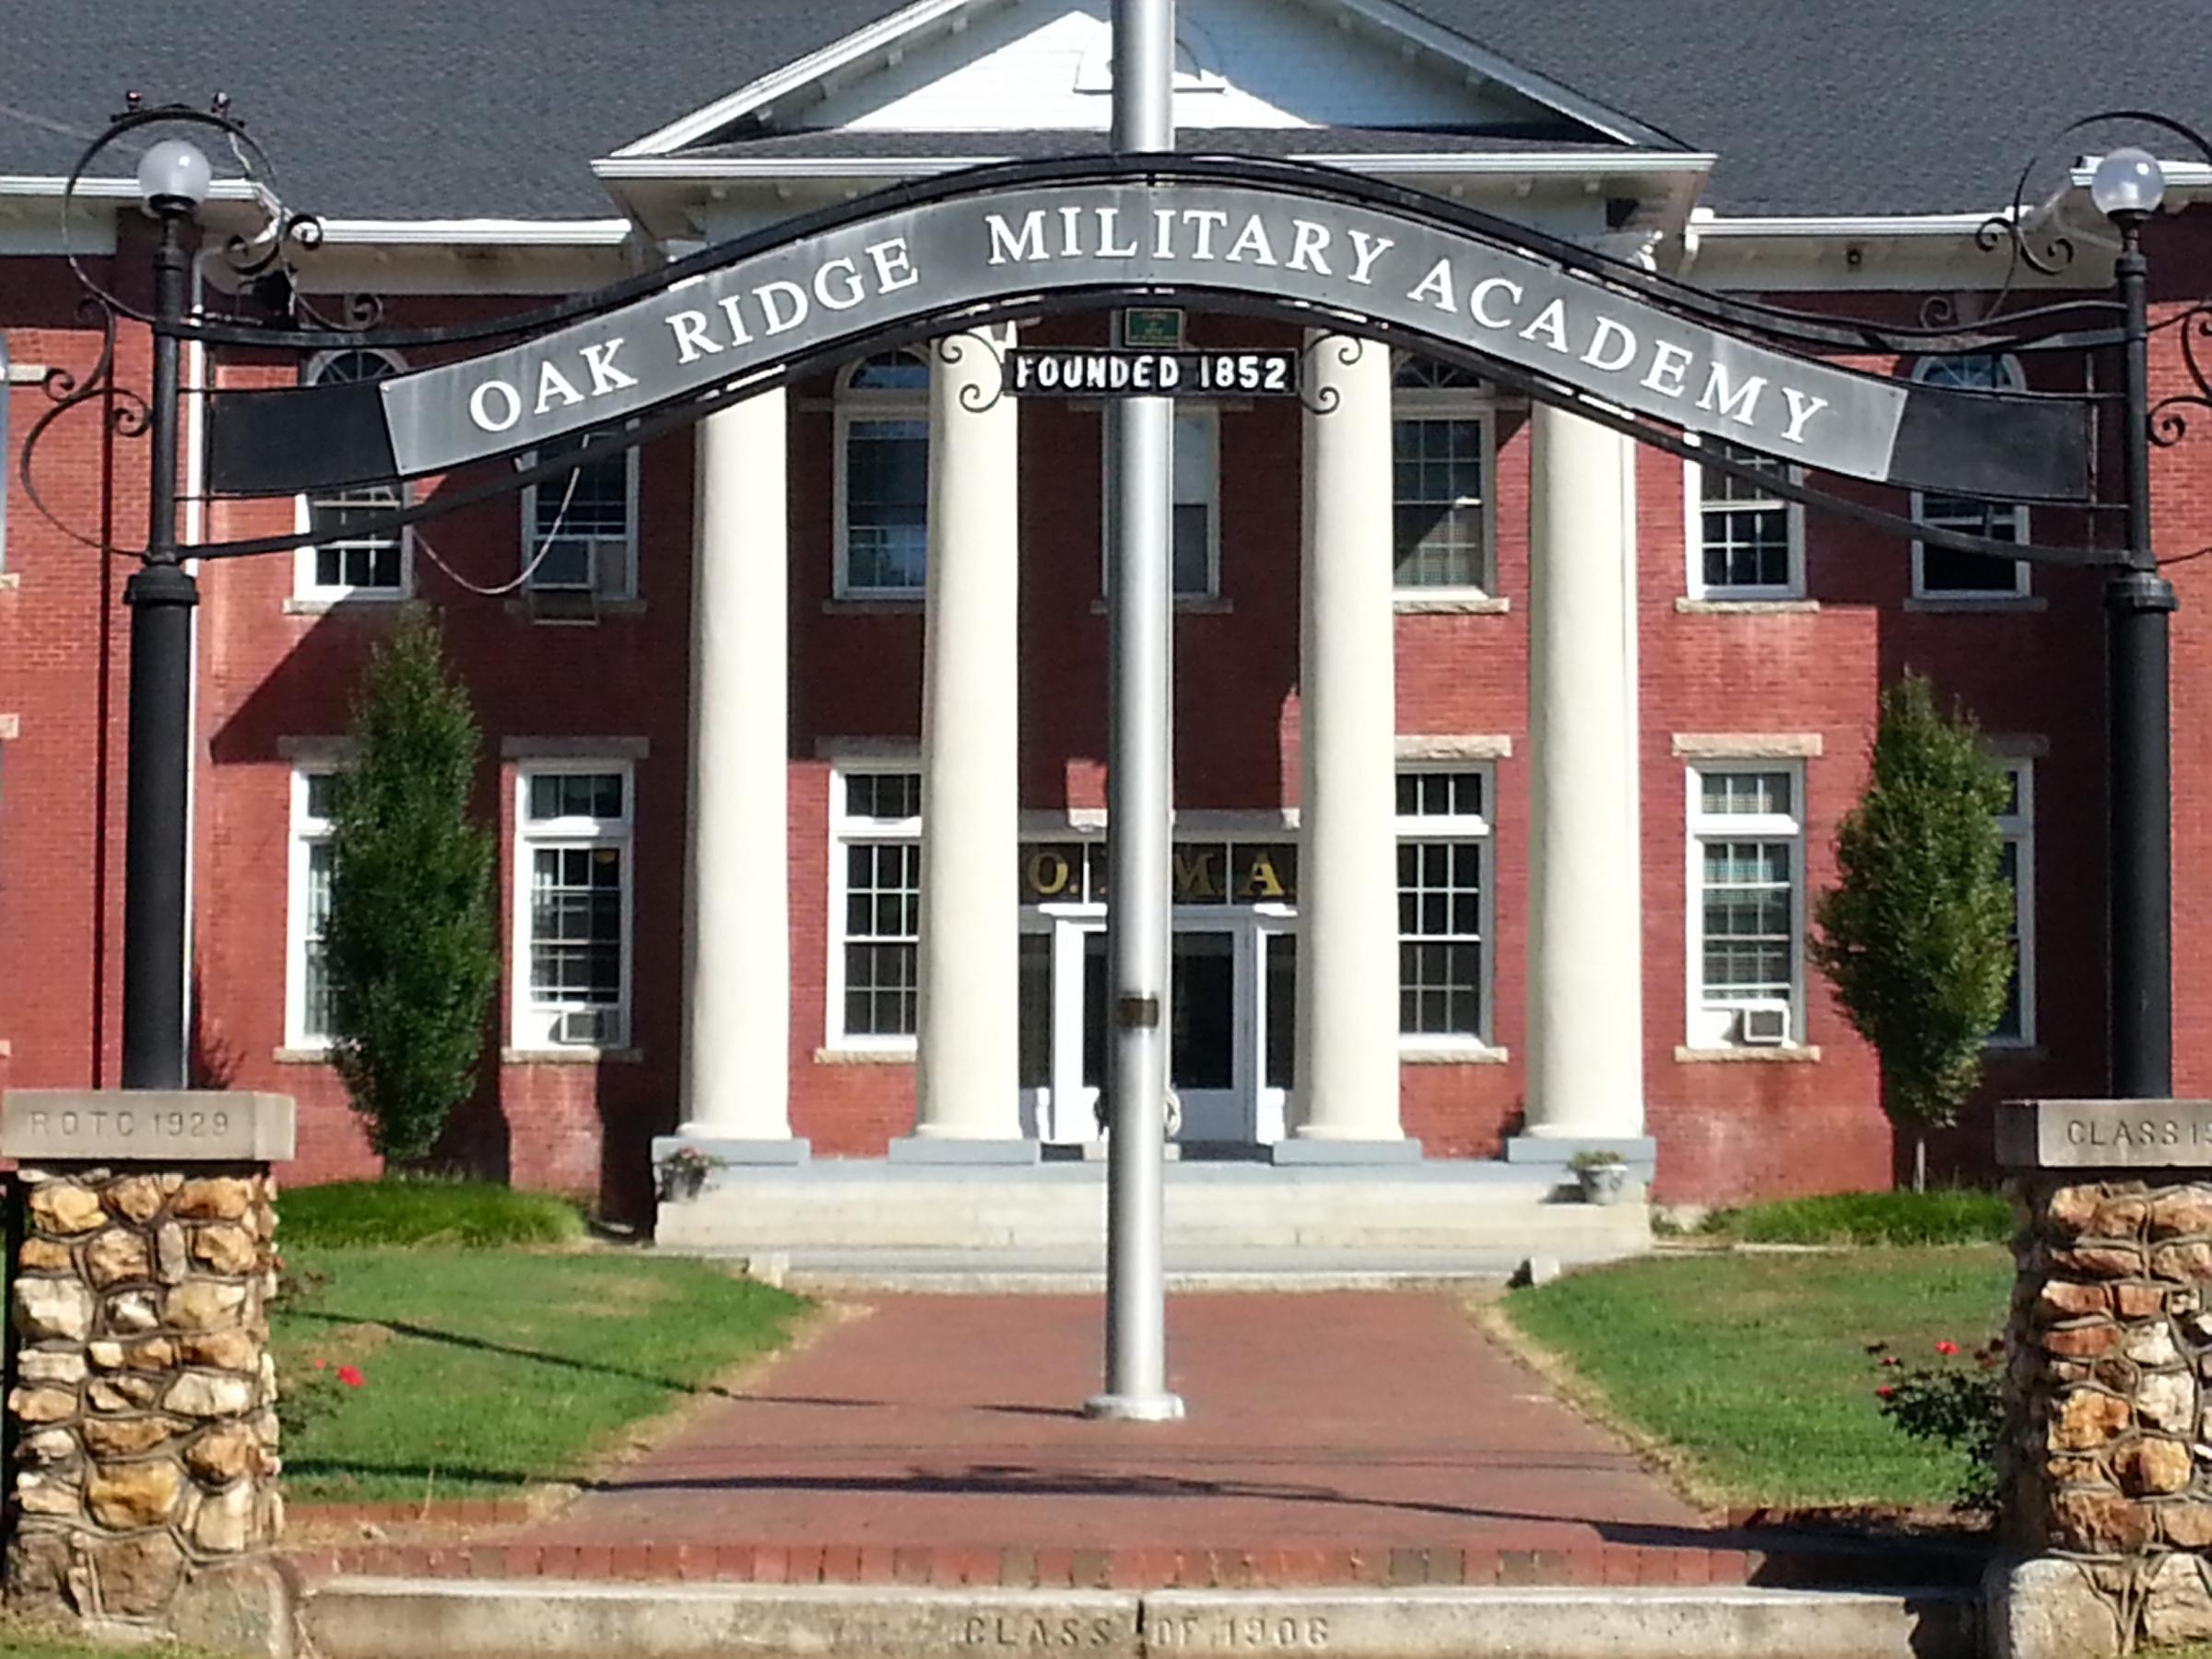 Oak Ridge Military Academy 2